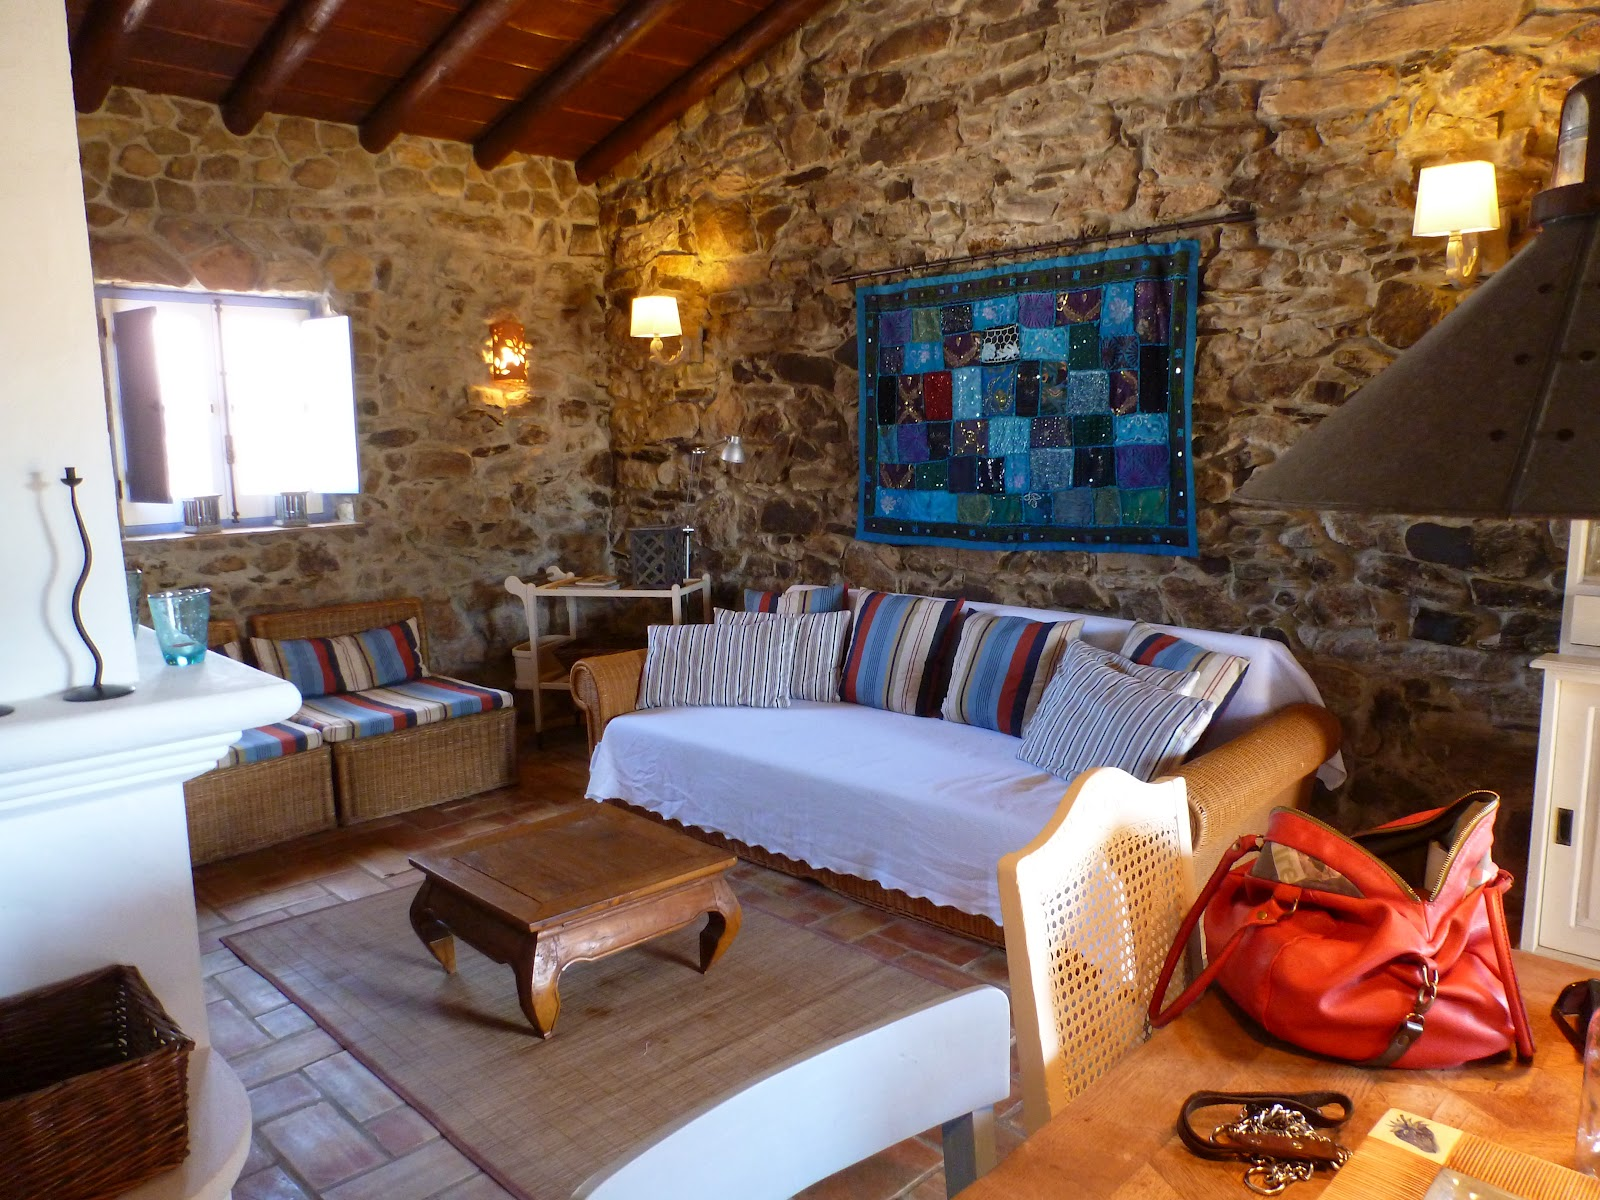 El portal de susana quinta das andorinhas casas rurales rom nticas y restauradas para recorrer - Casas de campo restauradas ...